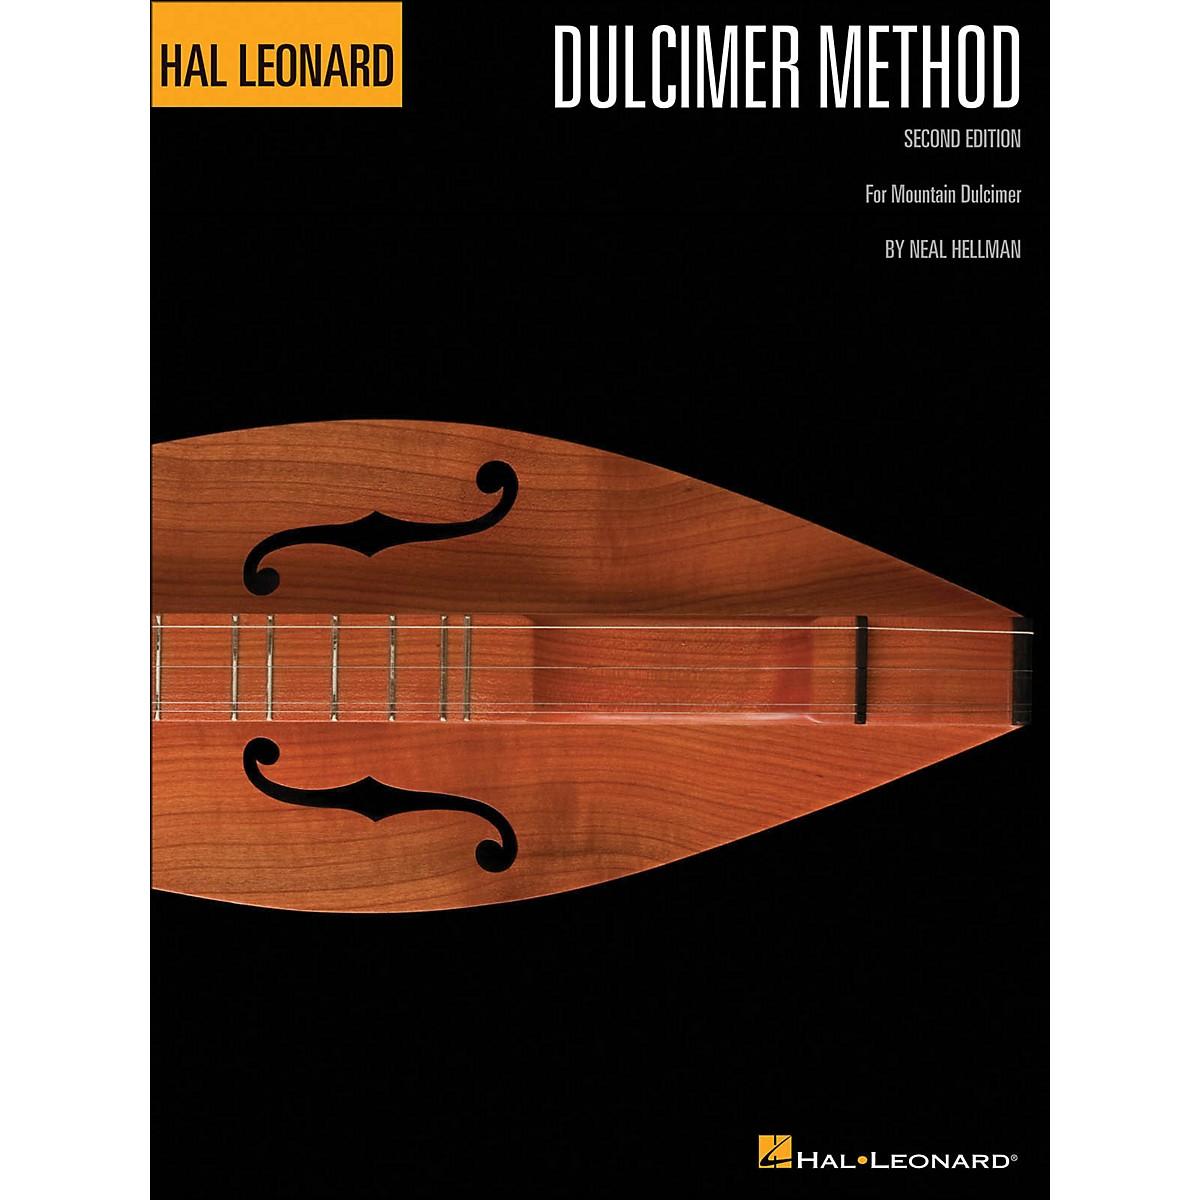 Hal Leonard Dulcimer Method for Beginning To Intermediate Players